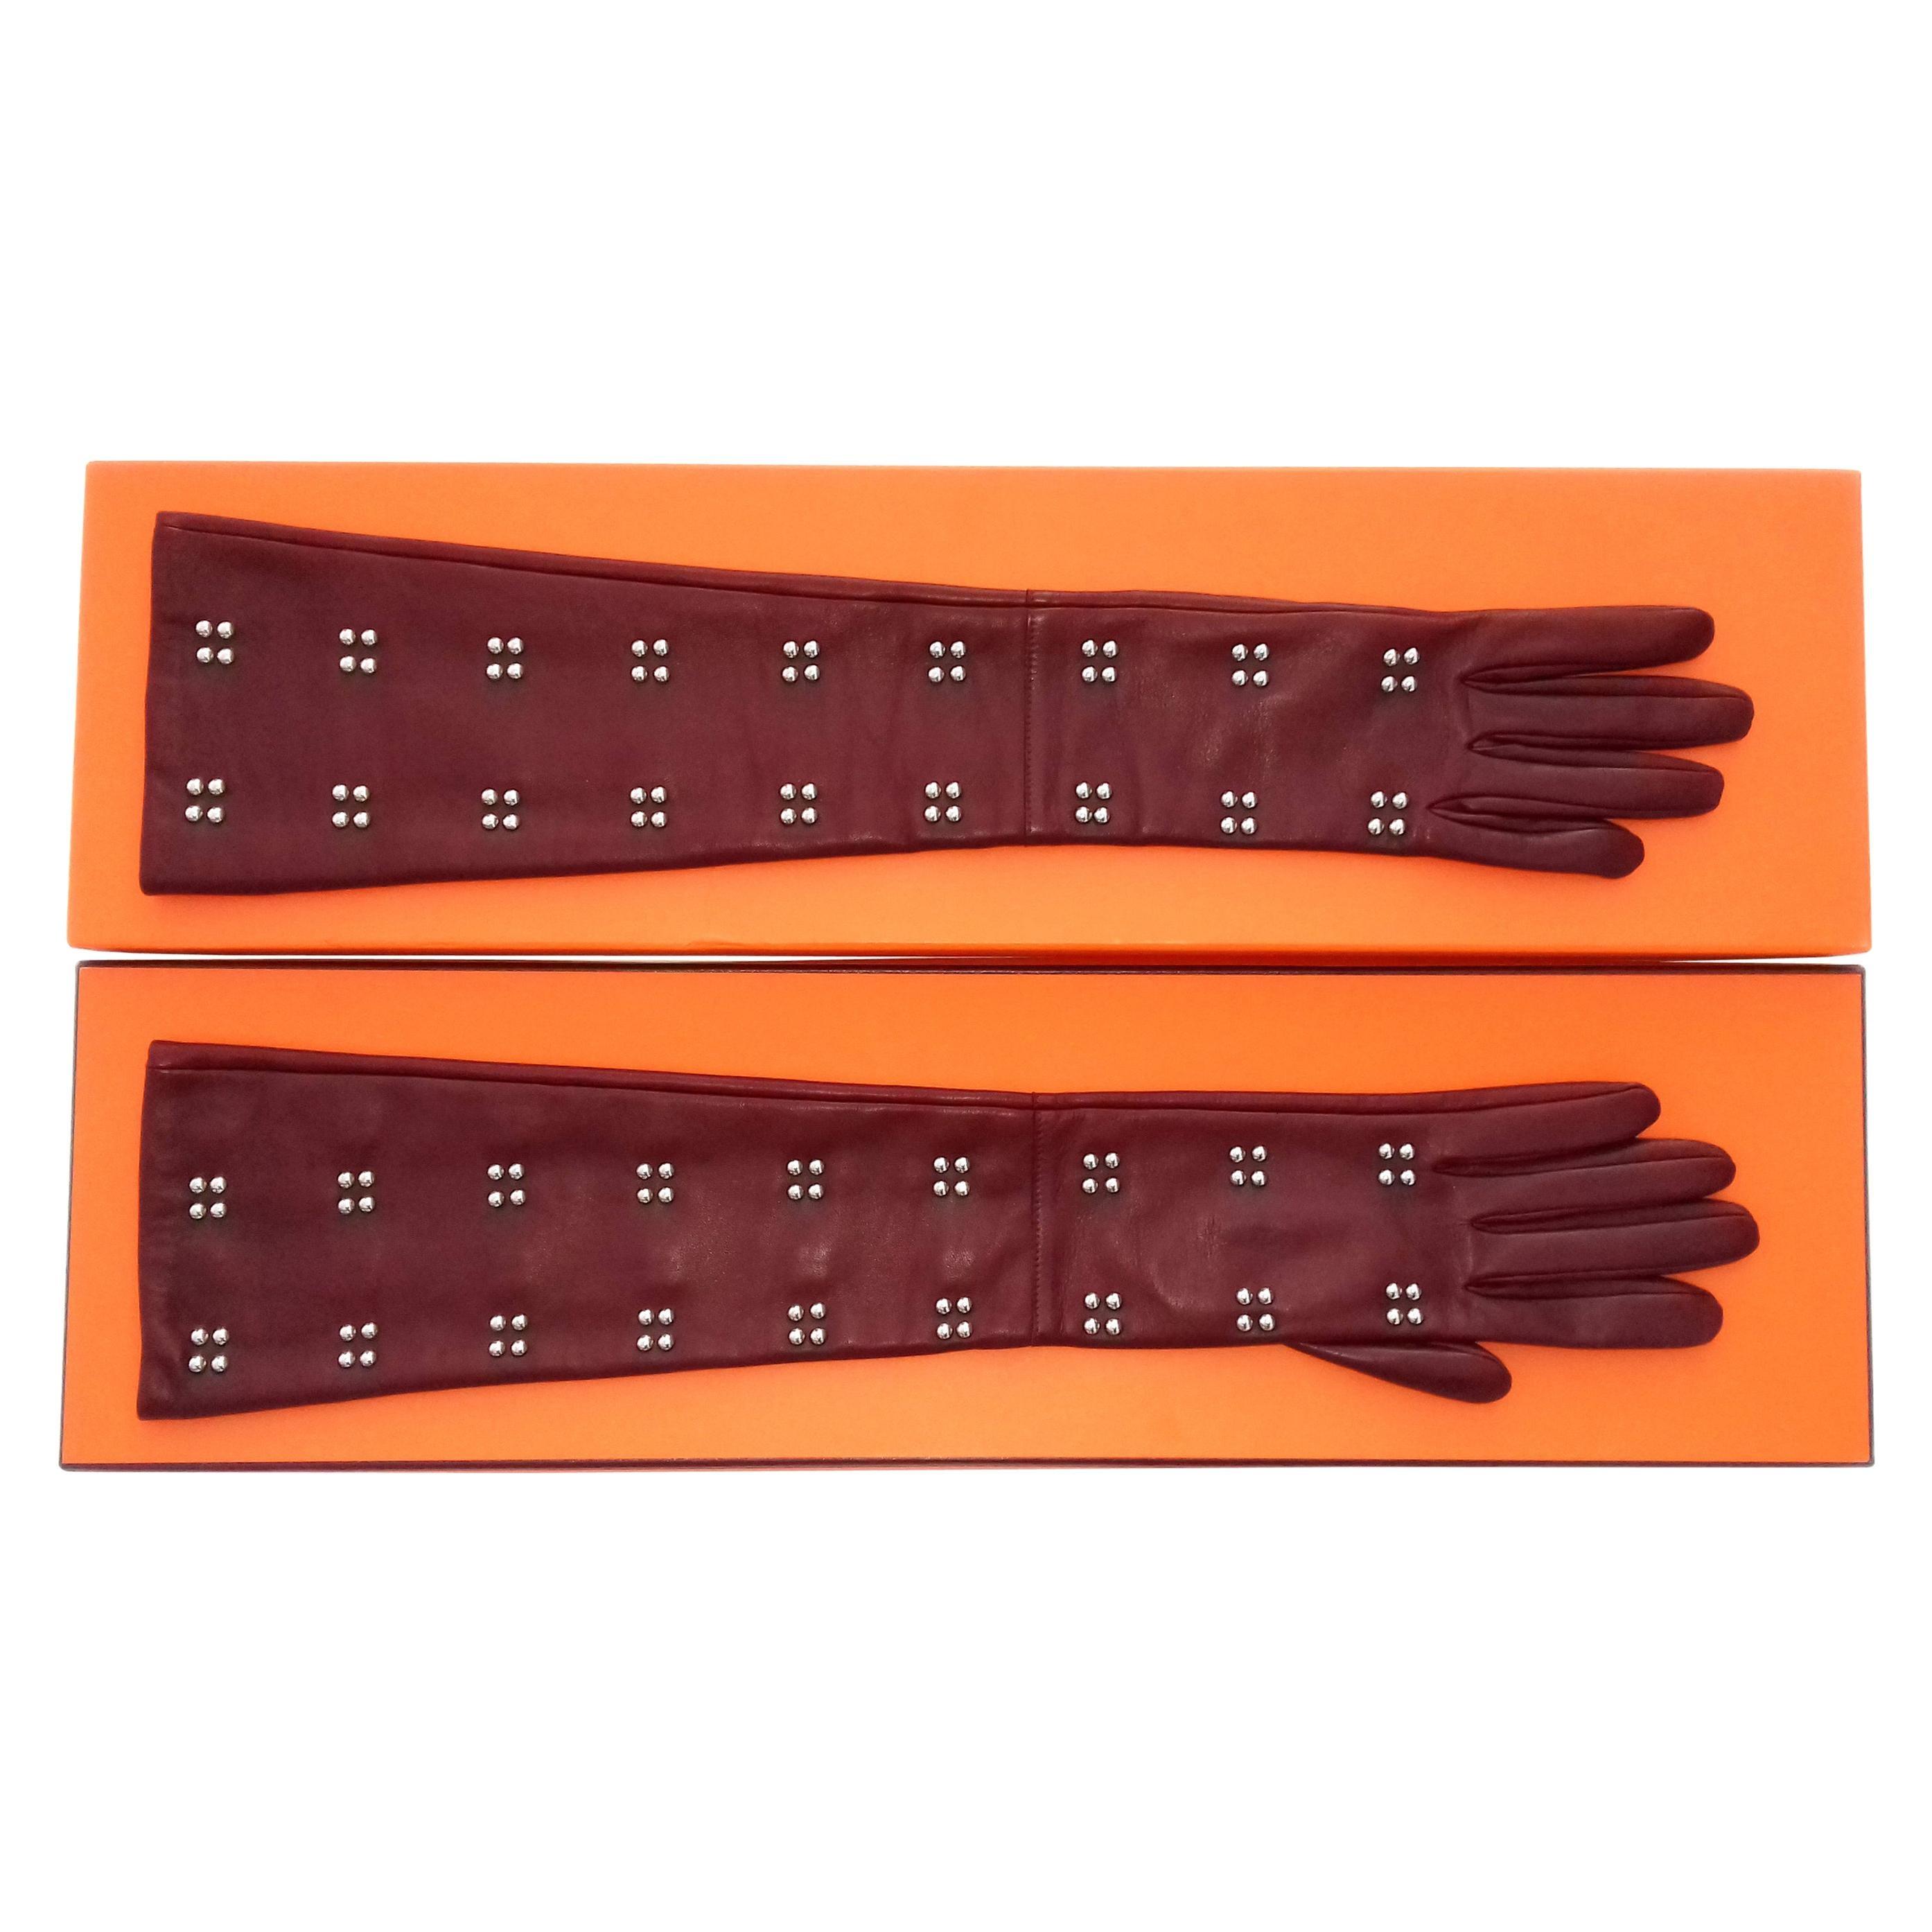 Hermès Long Opera Gloves Burgundy Lambskin Leather Size 6.5 in Box